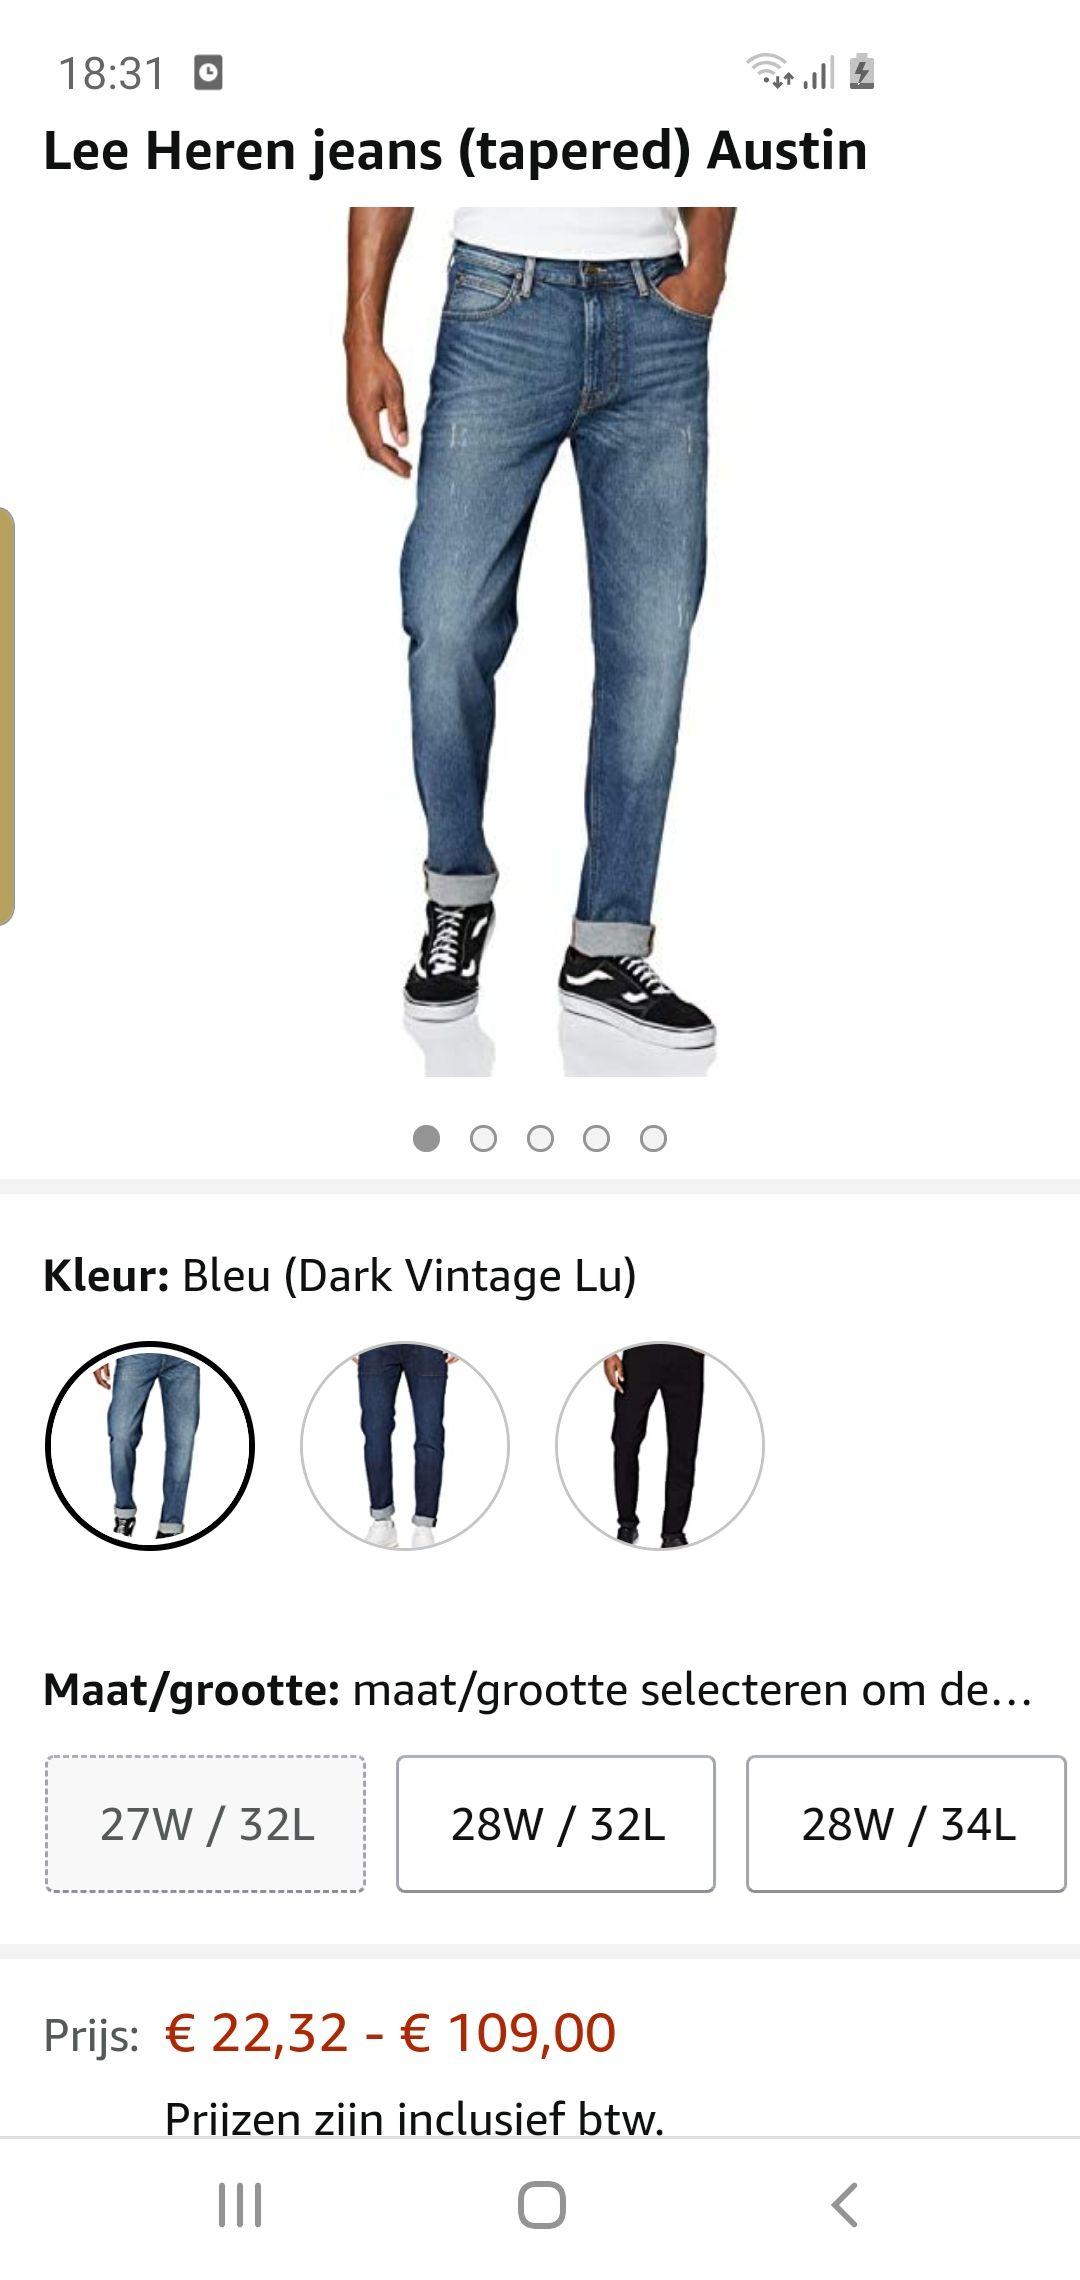 Lee jeans austin tapared